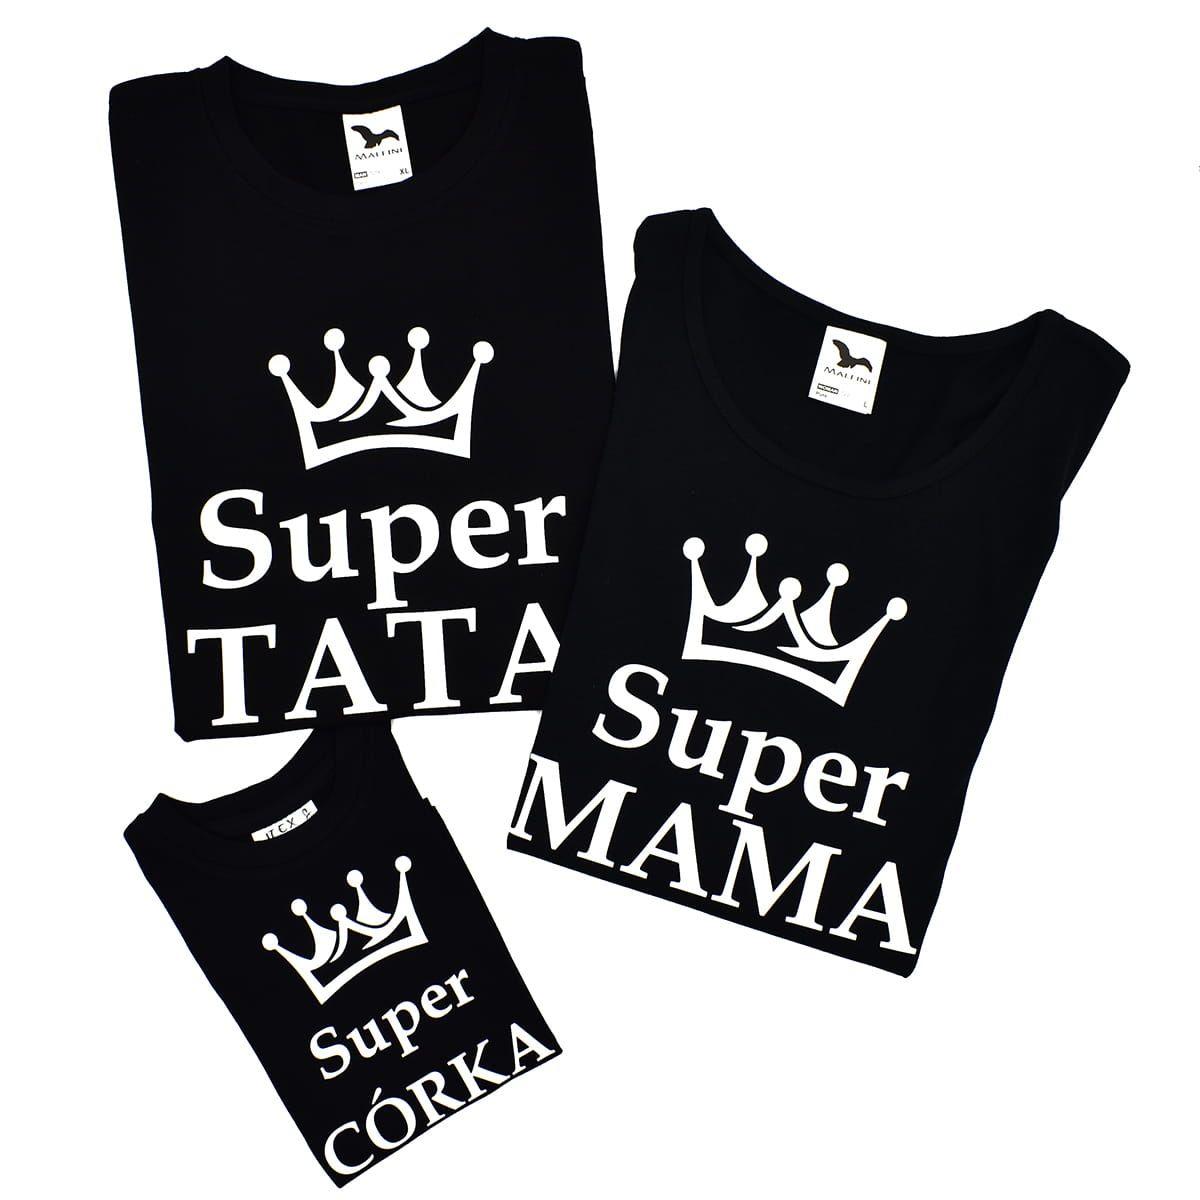 Zestaw Rodzinny Z Koronami Super Mama Super Tata Super Corka